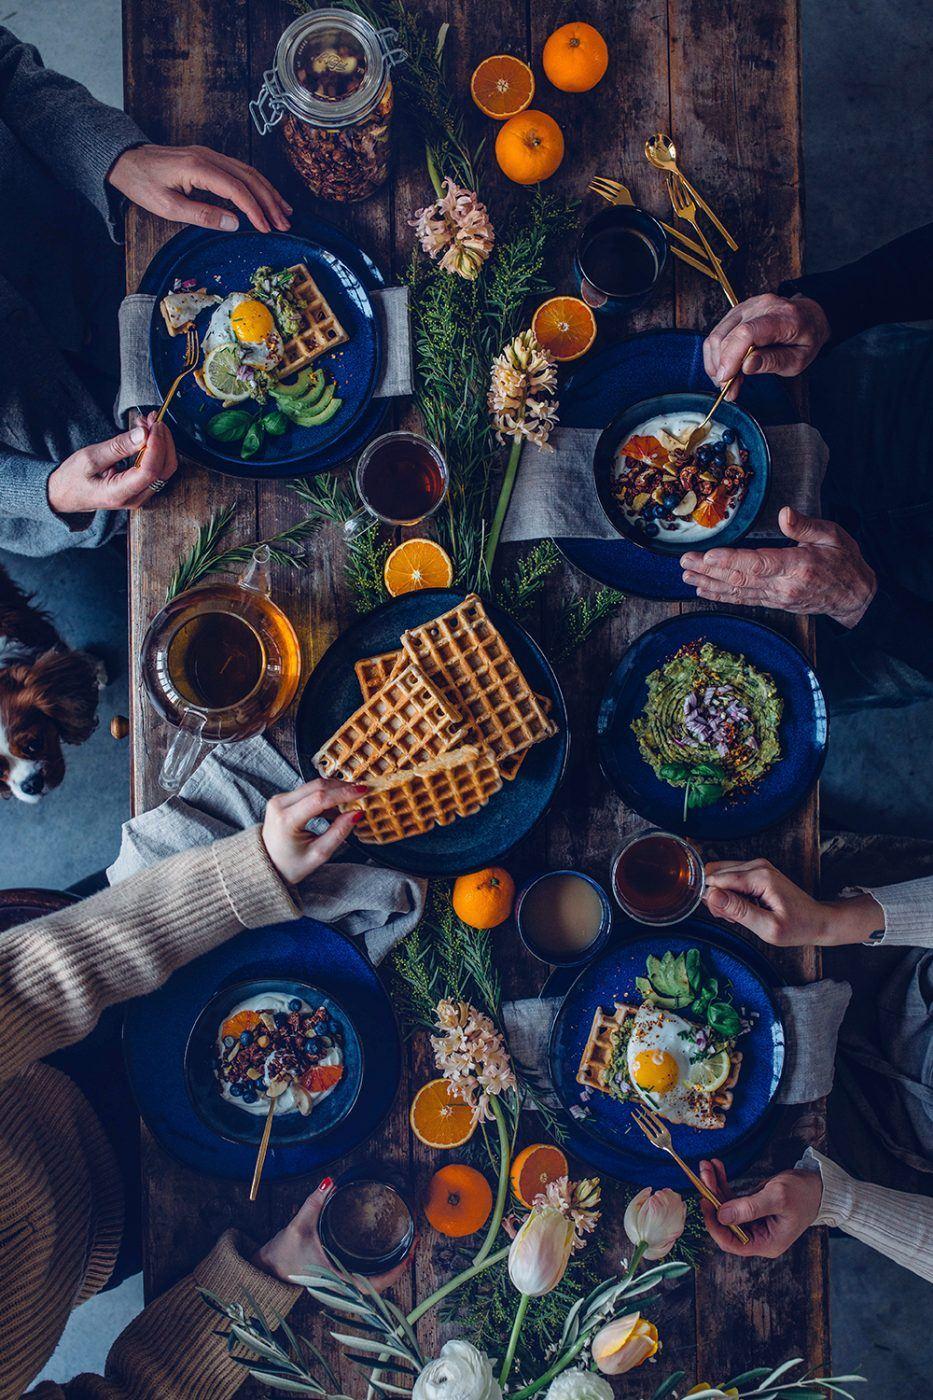 Image for Gluten-free Buckwheat Waffles with Fried Eggs – A little Breakfast Gathering